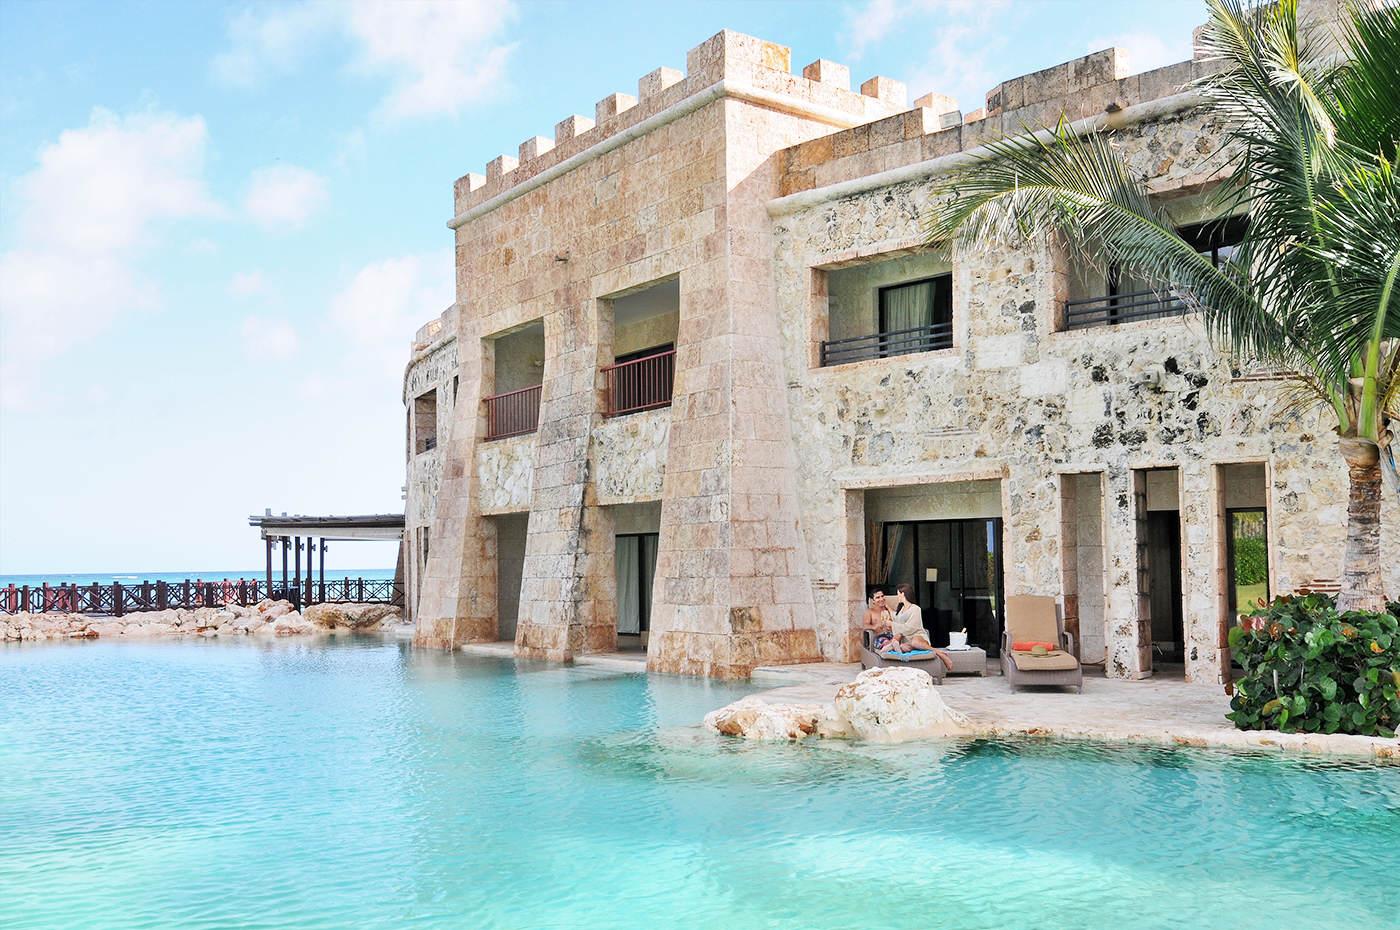 Sanctuary Cap Cana 5 dicas Viaje Global